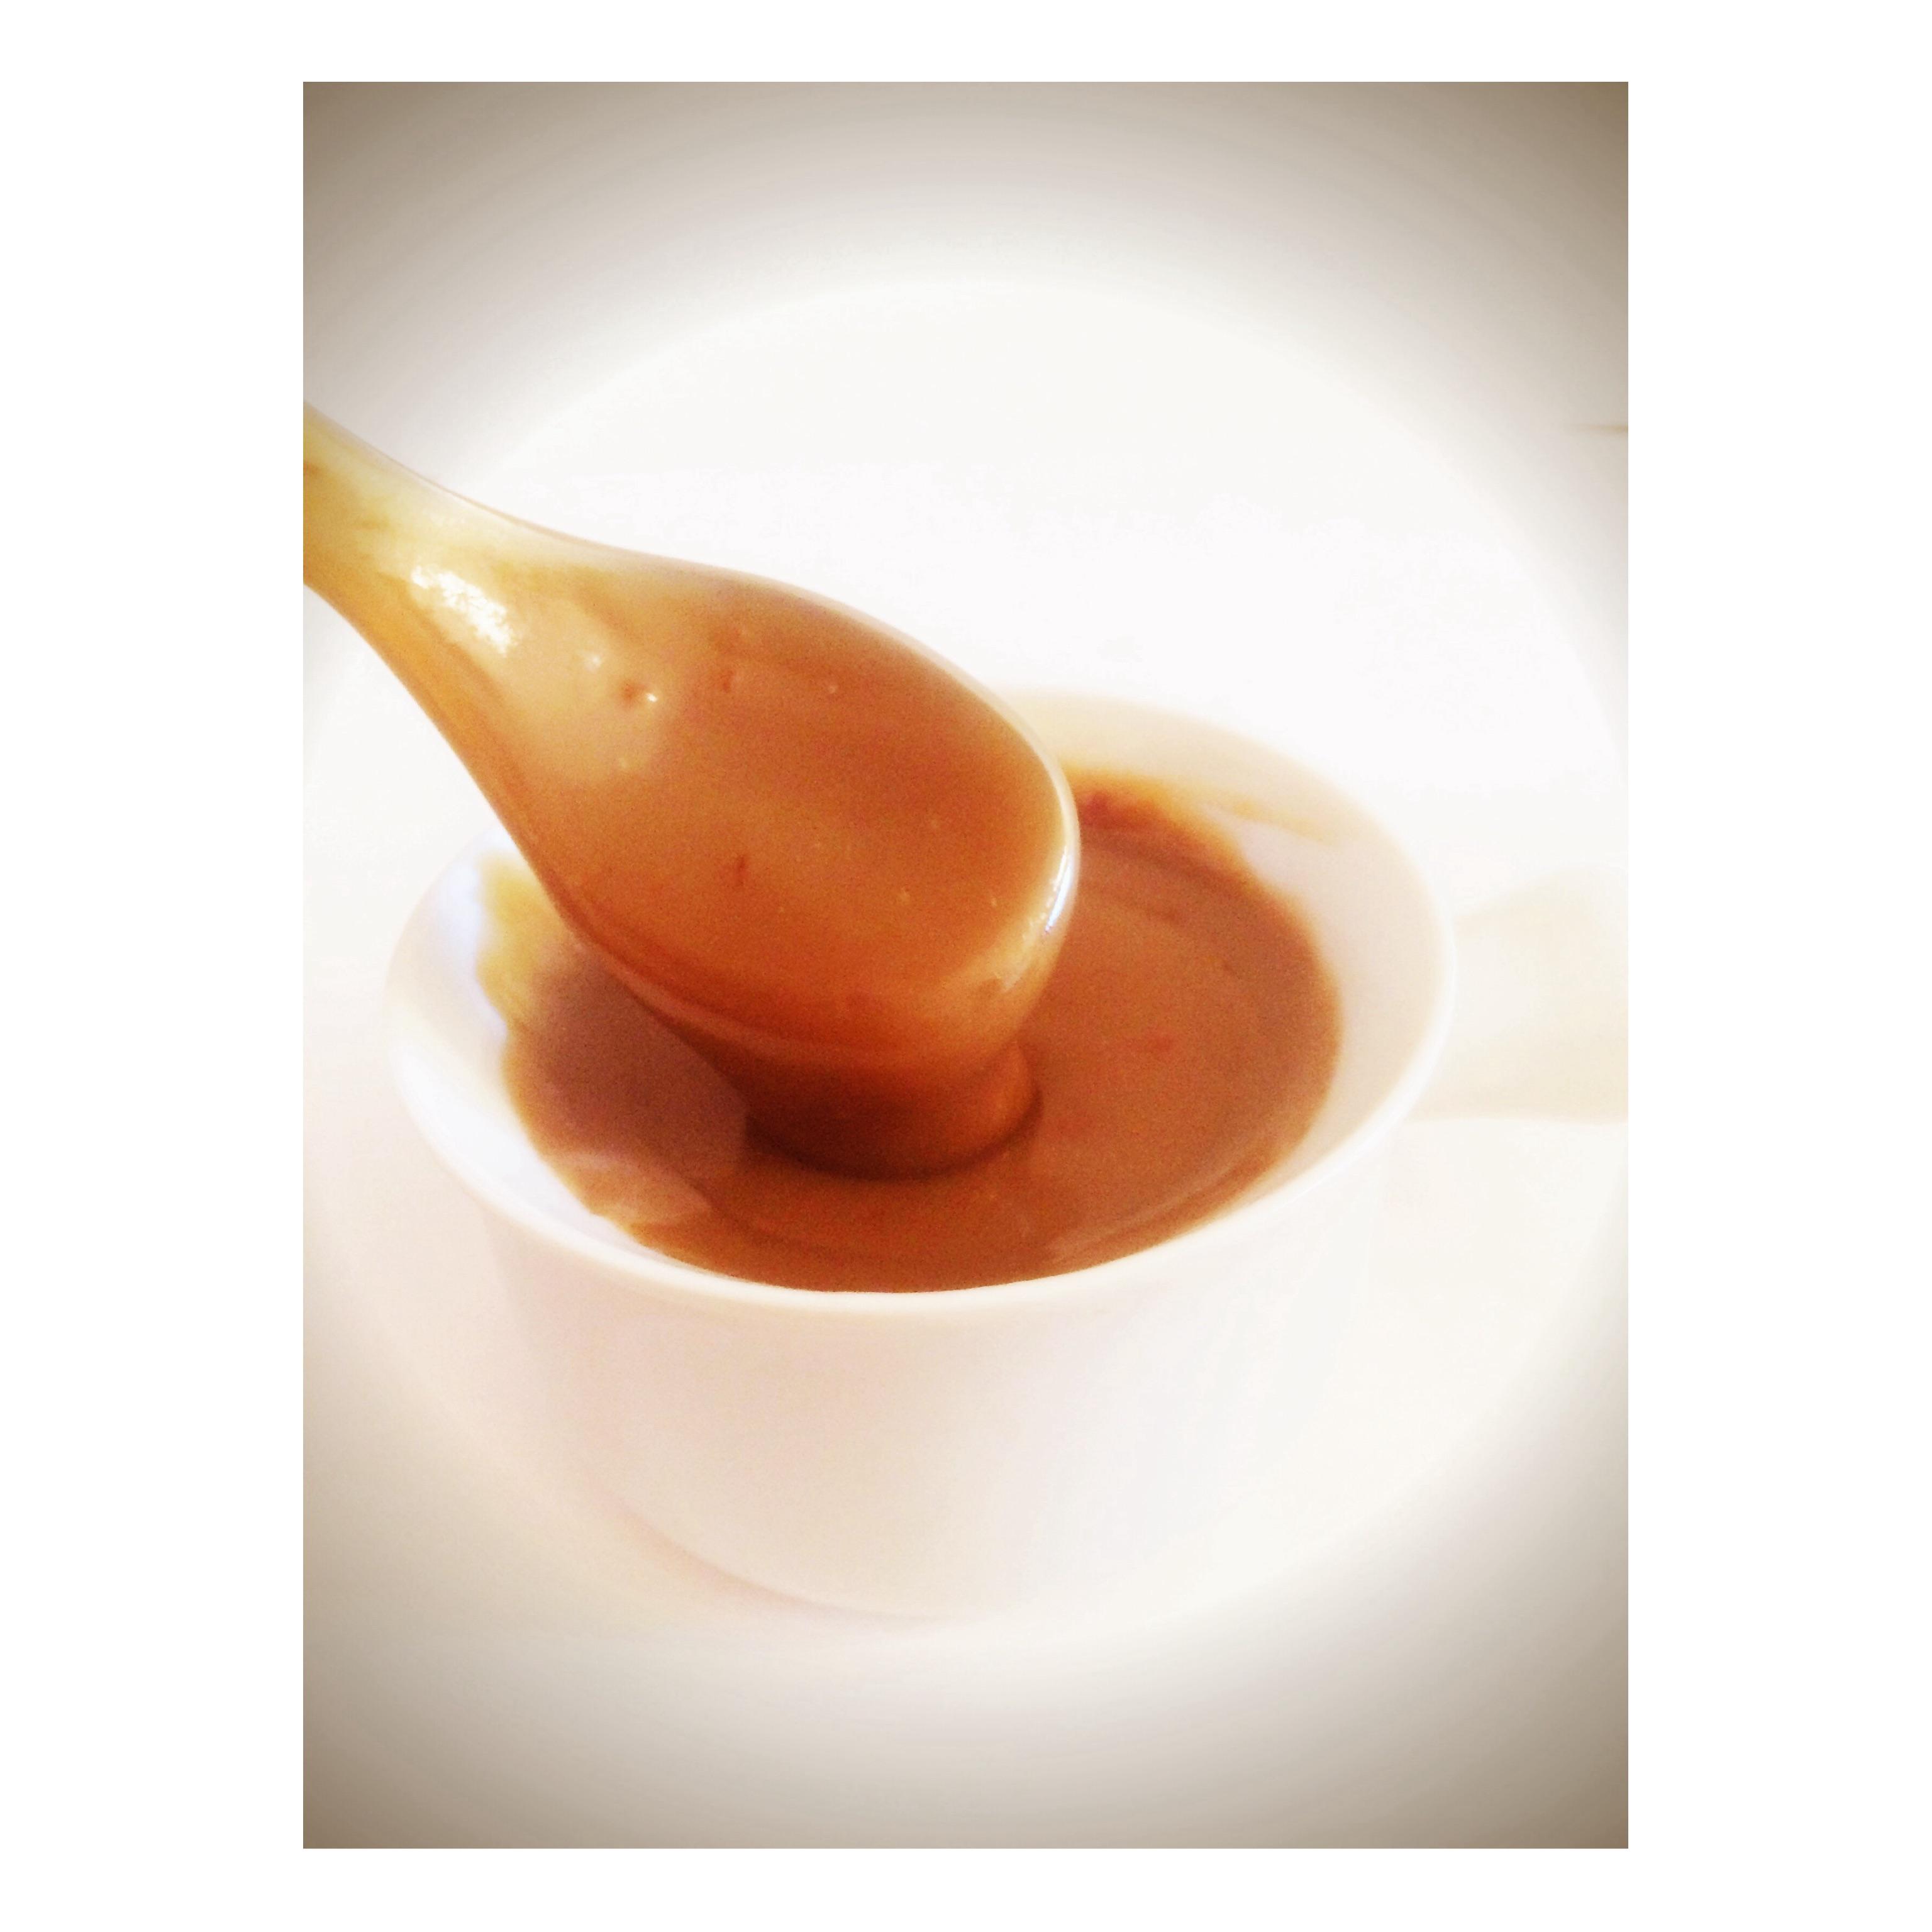 Caramel Gooey Goodness